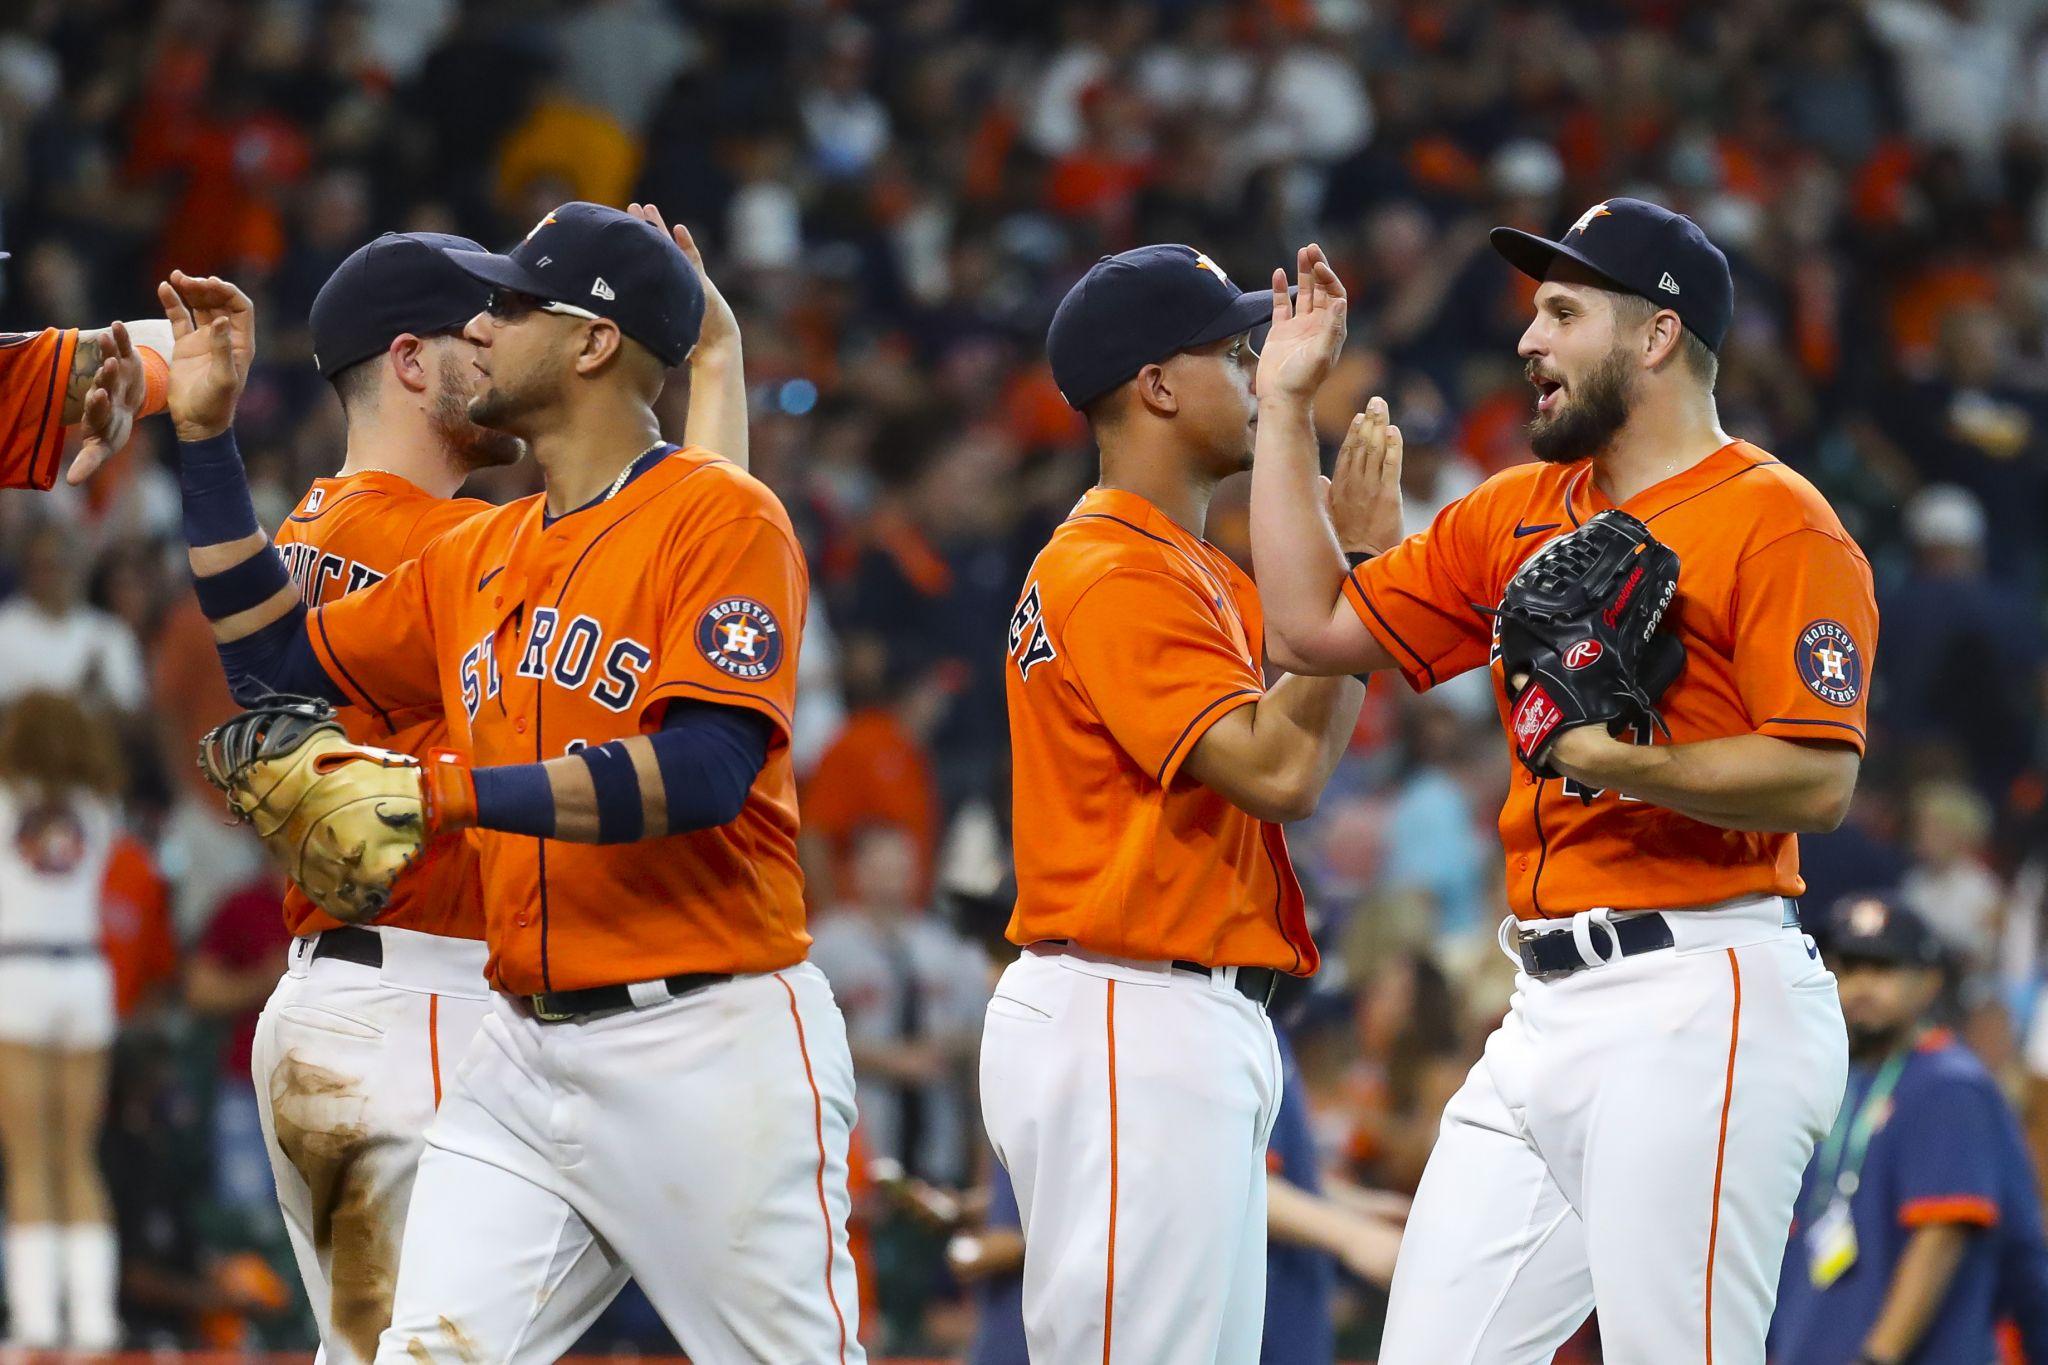 Live blog: Houston Astros vs. Chicago White Sox, ALDS Game 2 of 2021 MLB playoffs - Houston Chronicle